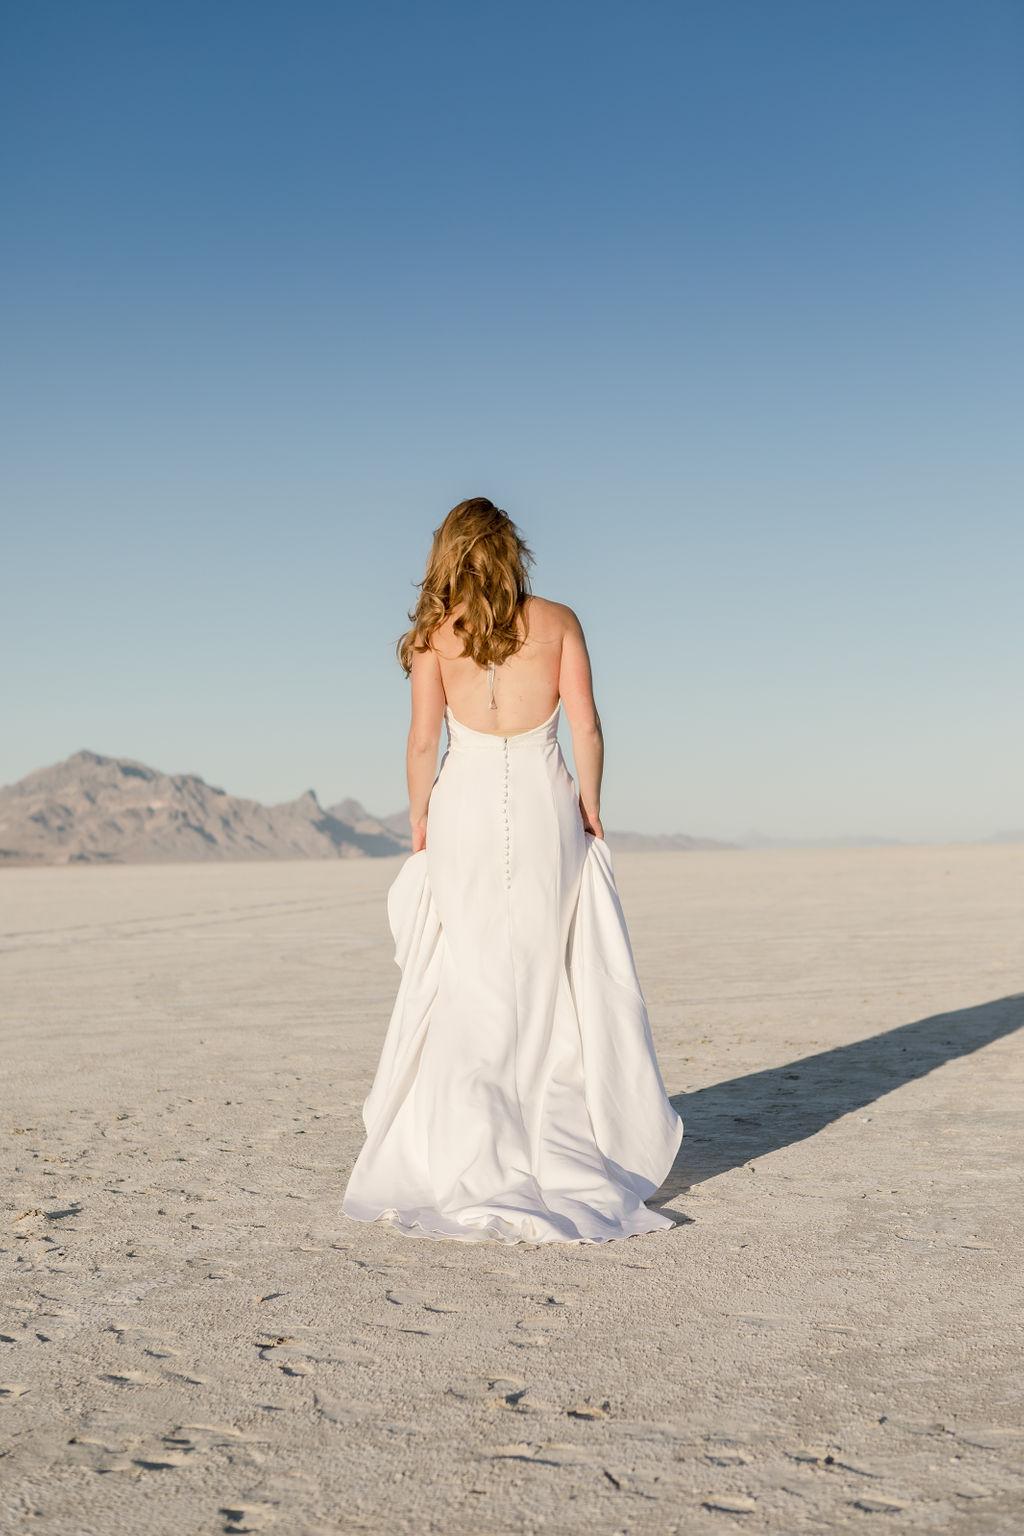 Simple Elegant Modern Goli June Brighton Wedding Dress Victoria Chukarov Salt Flats Utah 15